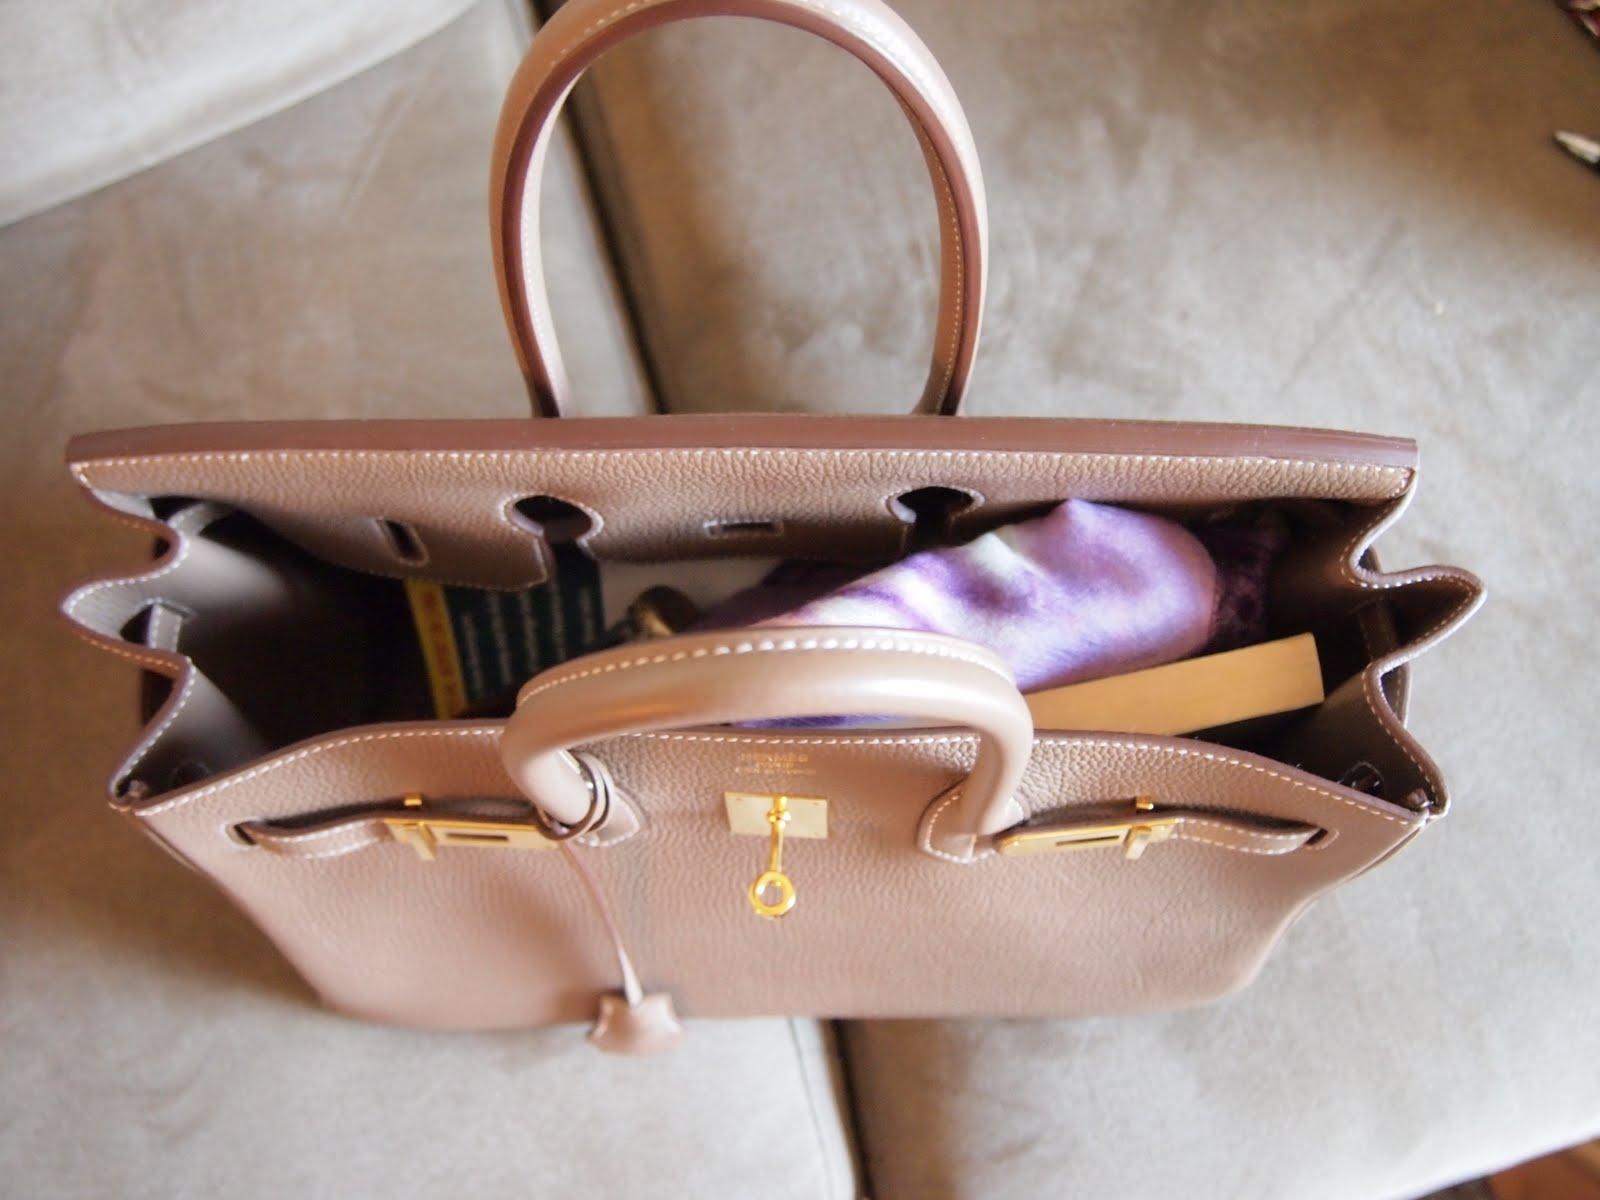 Hermes Birkin 30cm and 35cm vs. Chanel